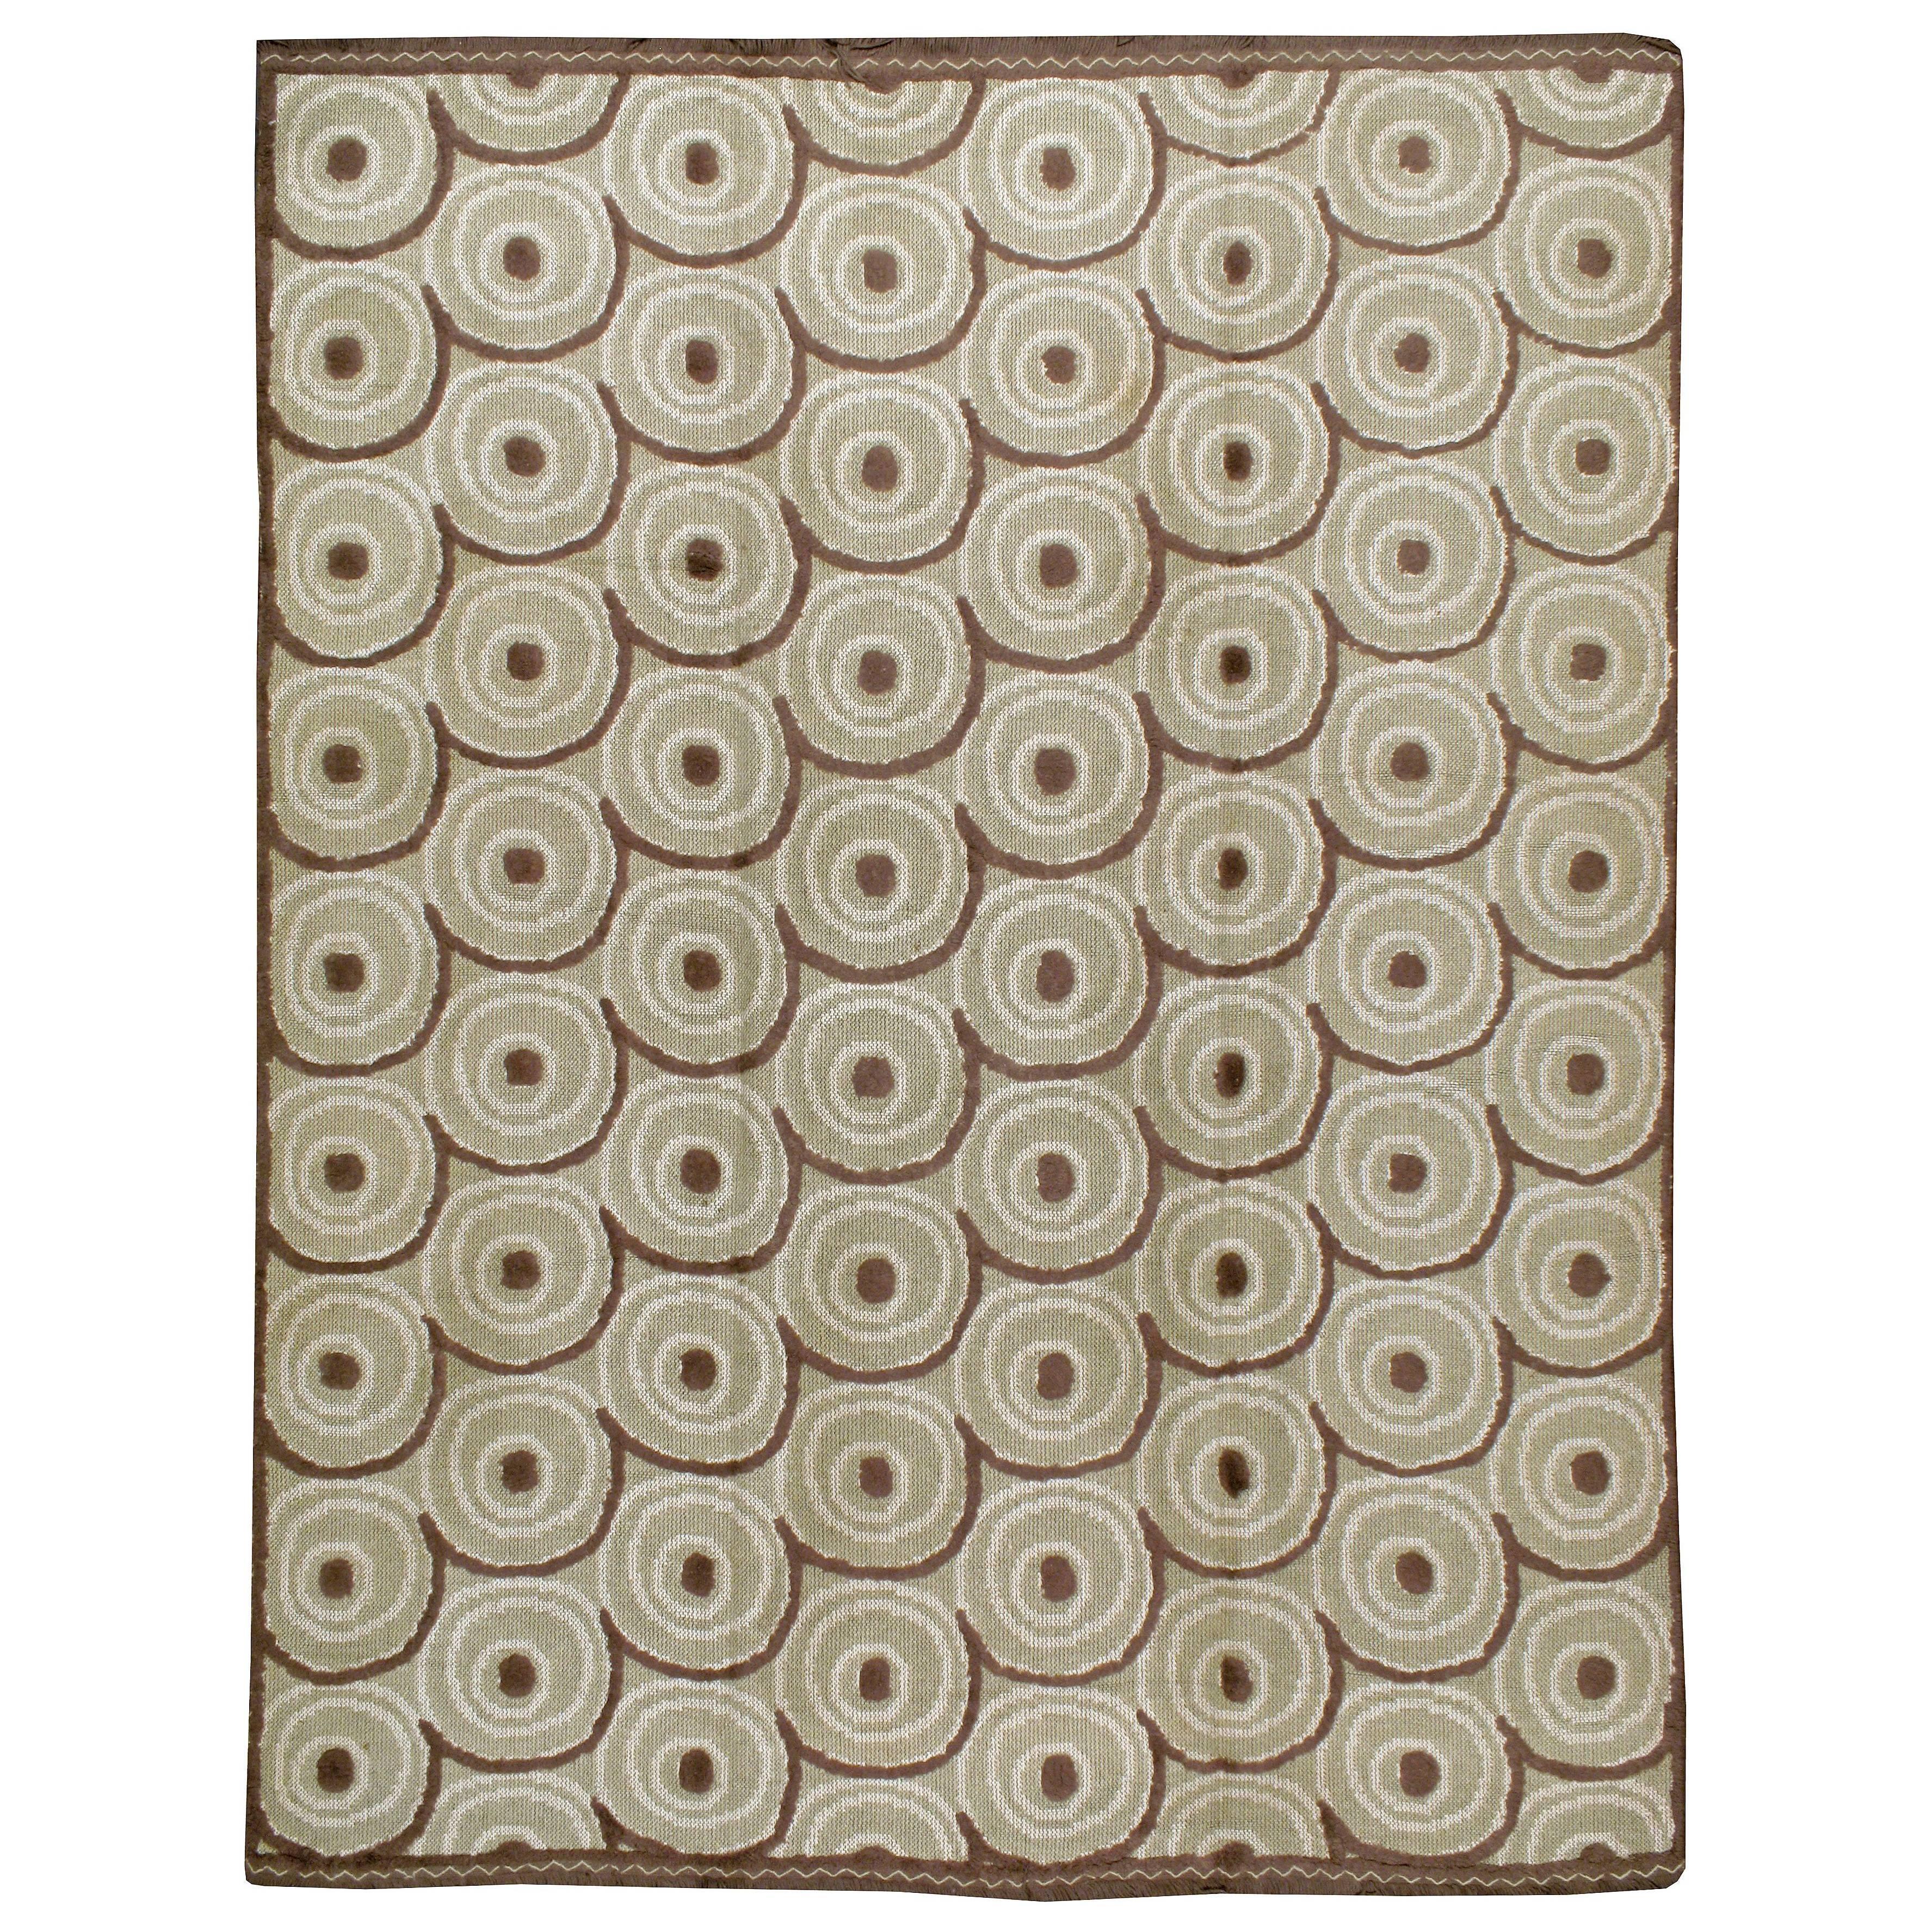 Vintage Spanish Textile Flat-weave Rug